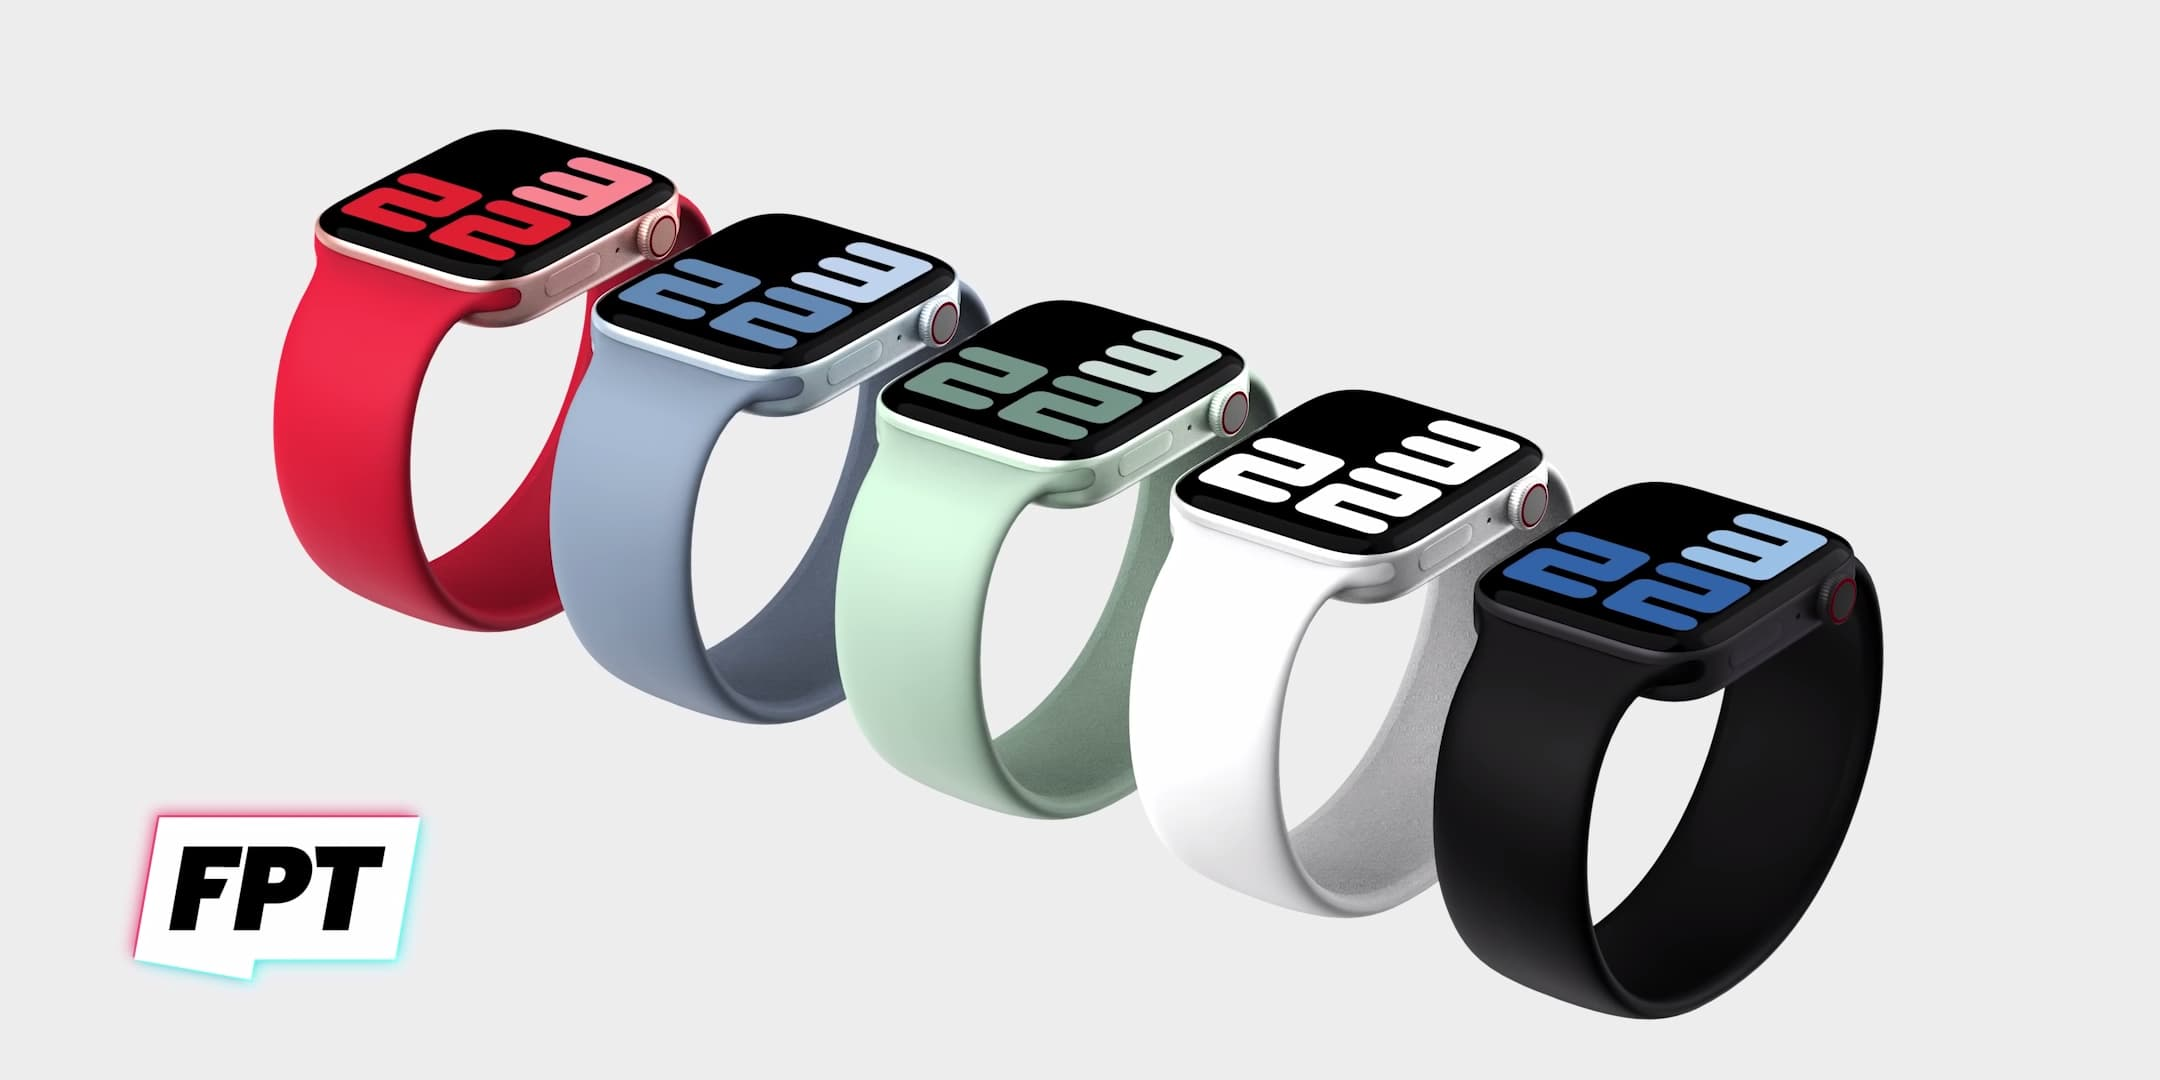 Apple Watch Series 7 外型曝光 採平整邊框和「綠色」新配色4